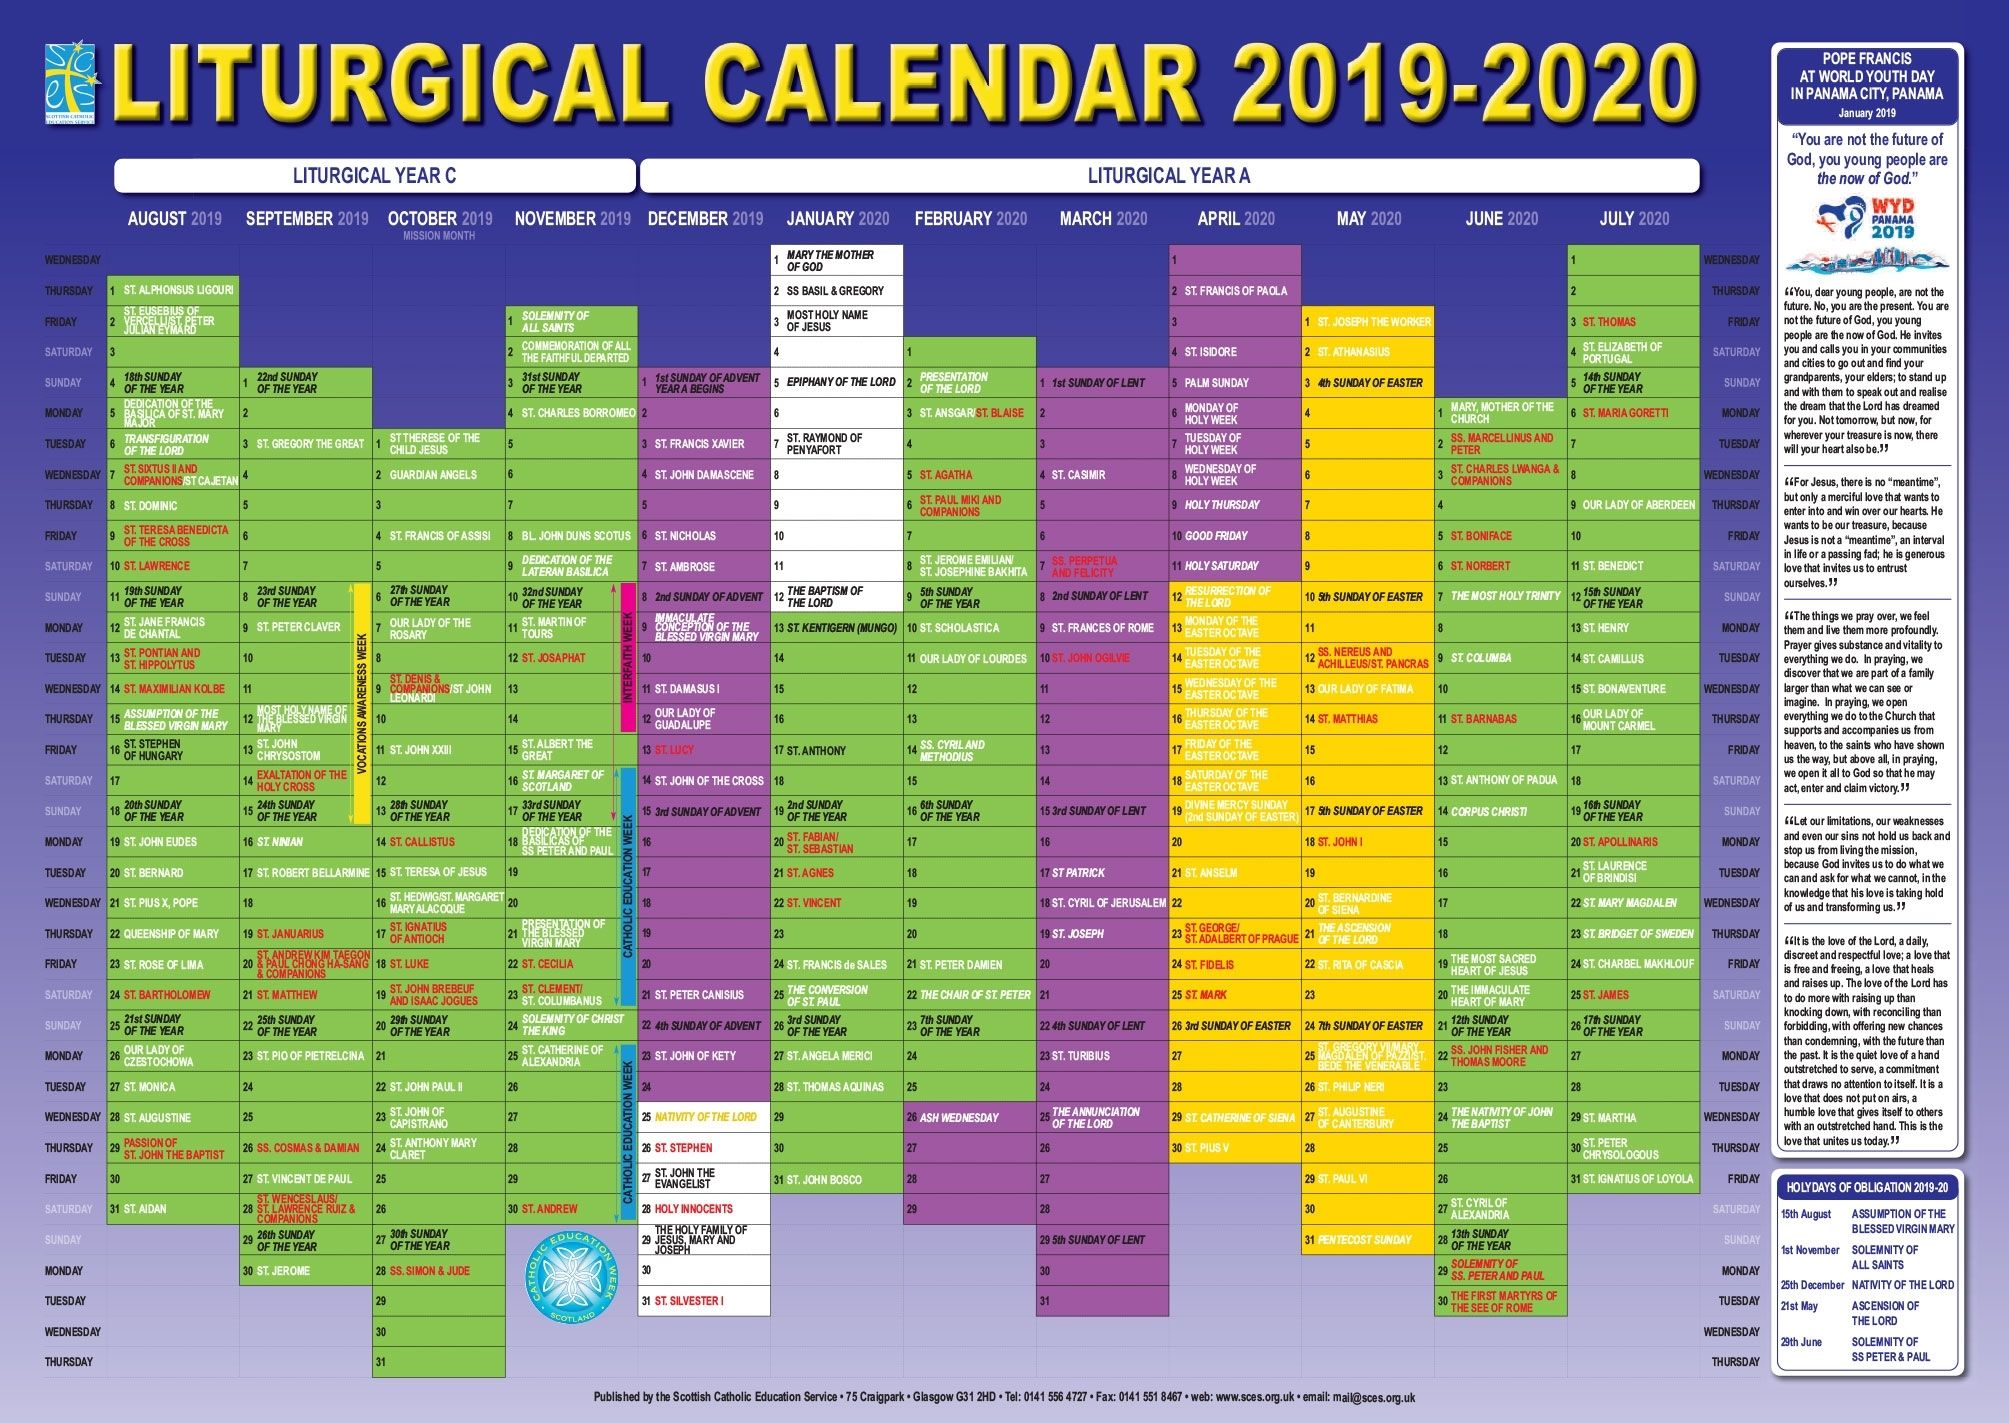 University Of Miami Spring 2022 Calendar.2020 Catholic Liturgical Calendar Colors Catholic Liturgical Calendar Calendar Printables Calendar